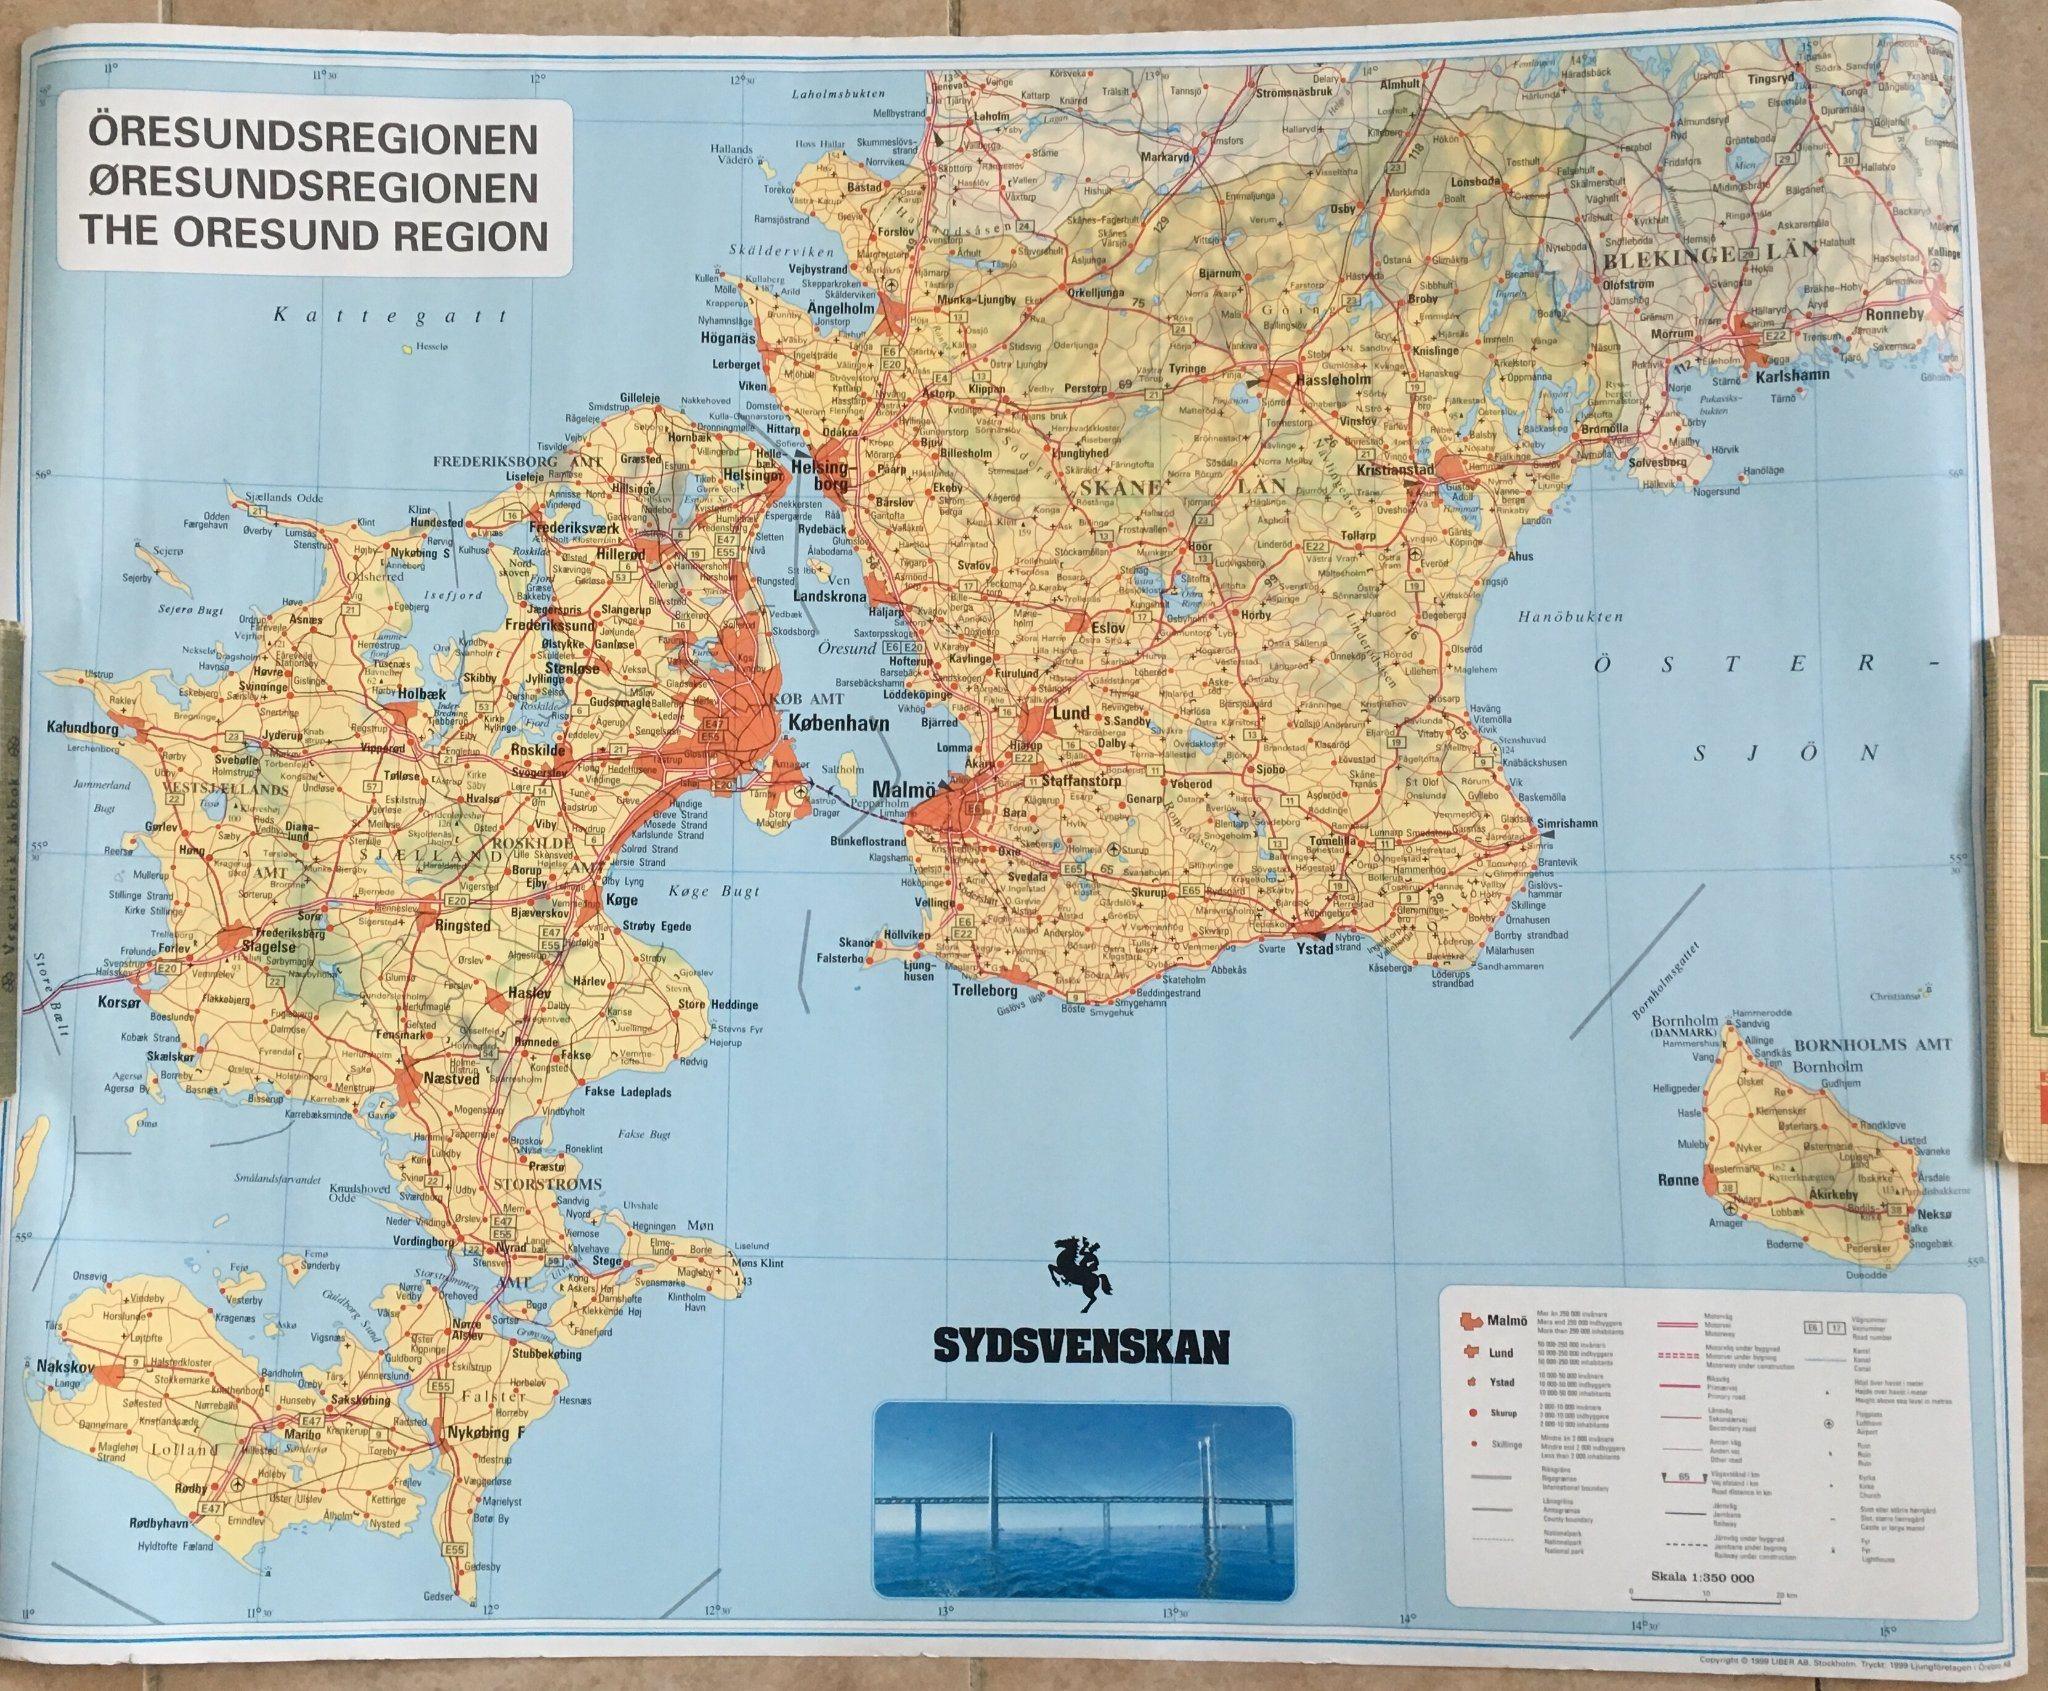 Karta Skane Och Danmark.Karta Norden Danmark Skane Sydsvenskan 342734169 ᐈ Kop Pa Tradera